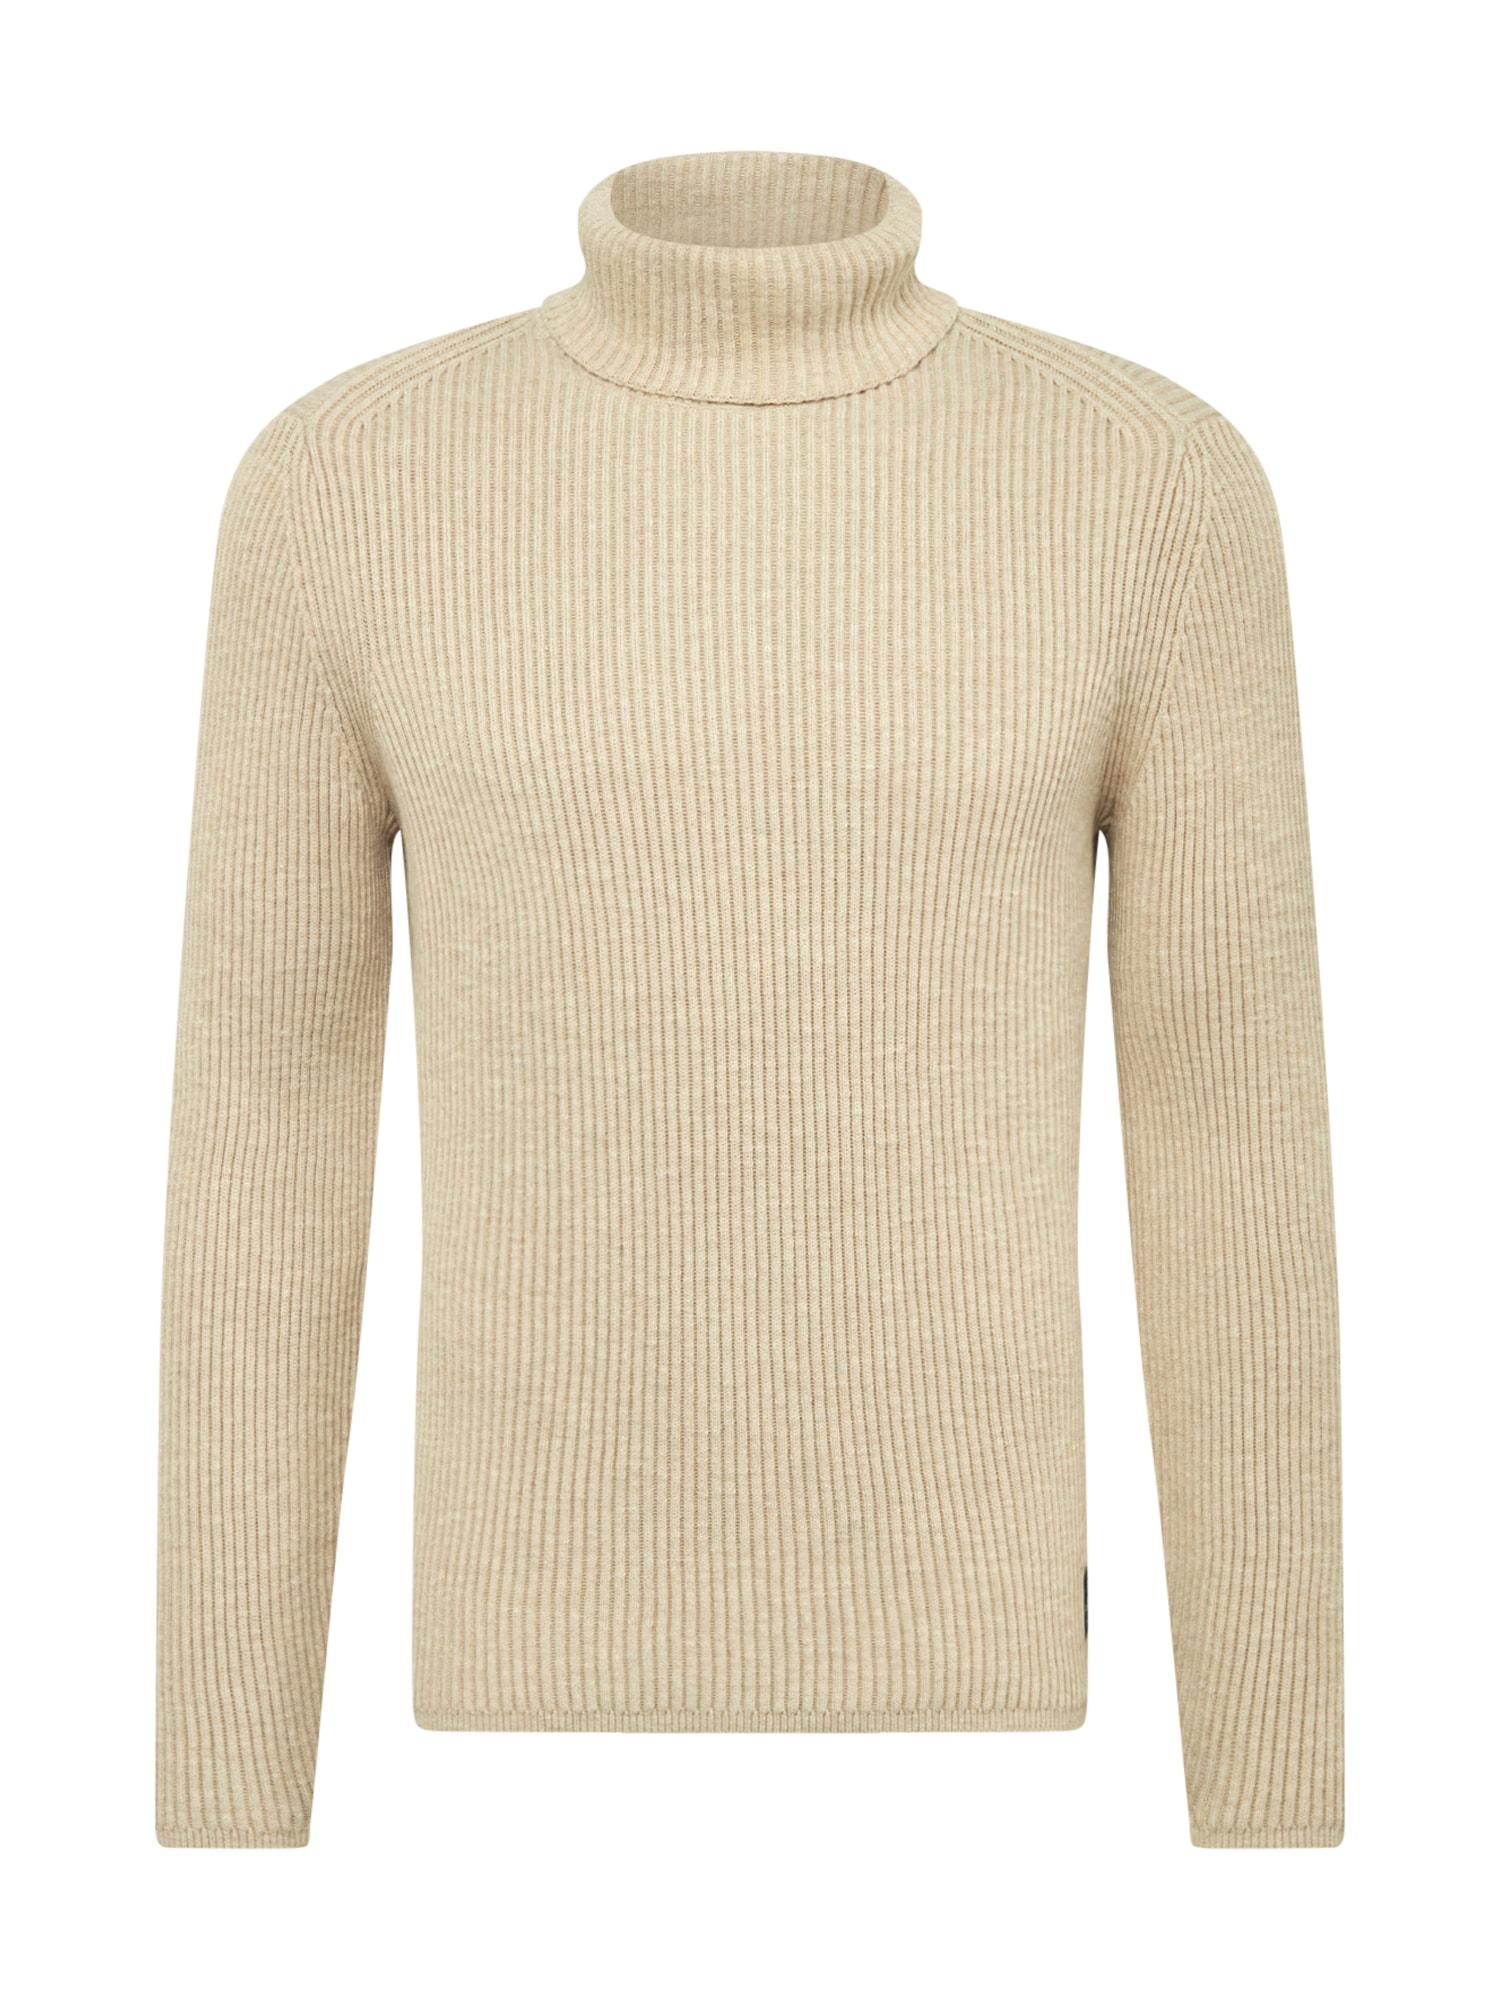 Marc O'Polo Megztinis nebalintos drobės spalva